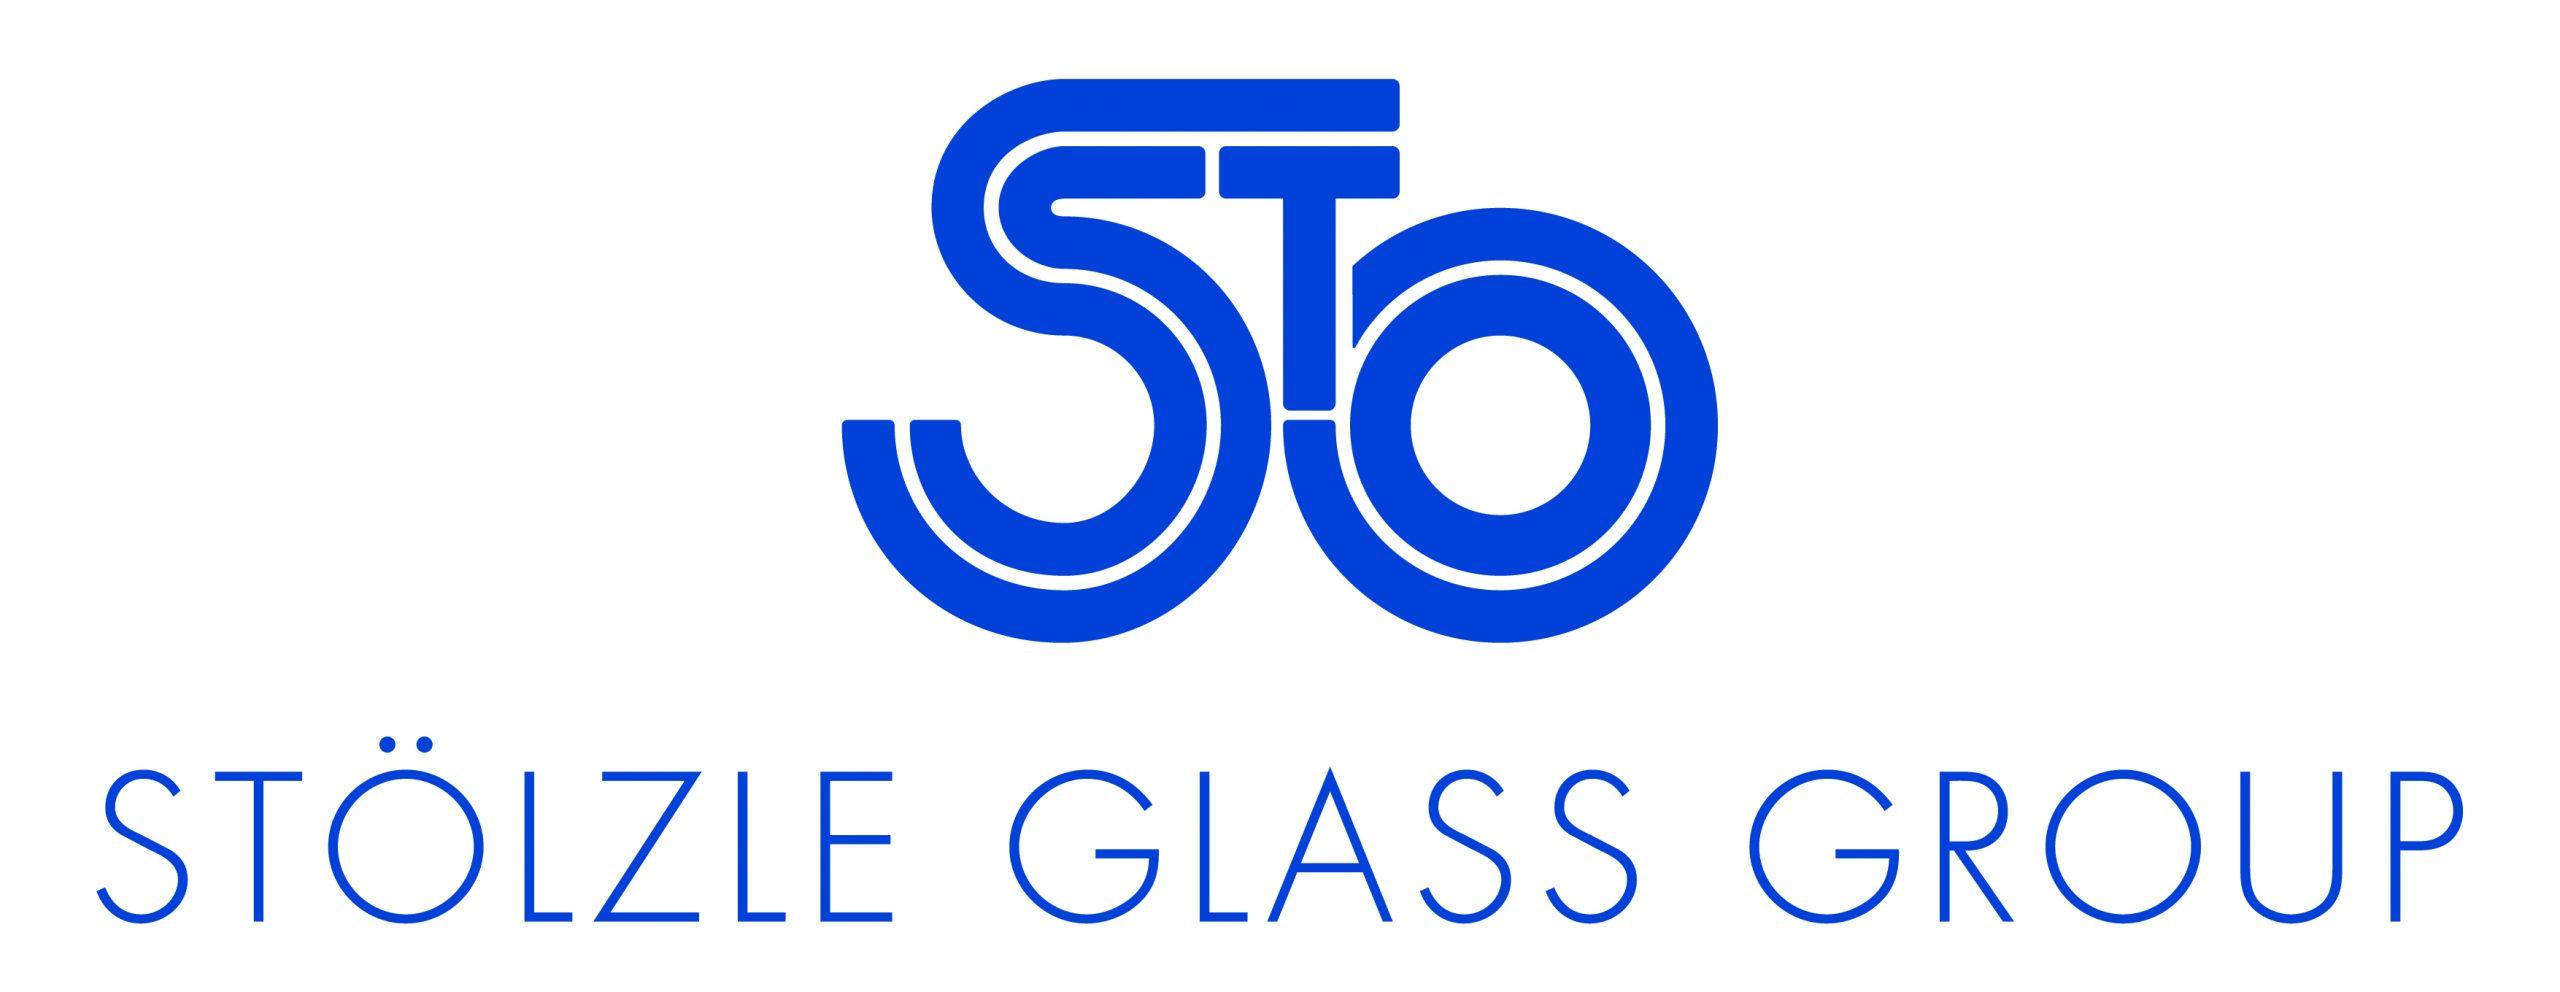 Stölzle Glas GmbH